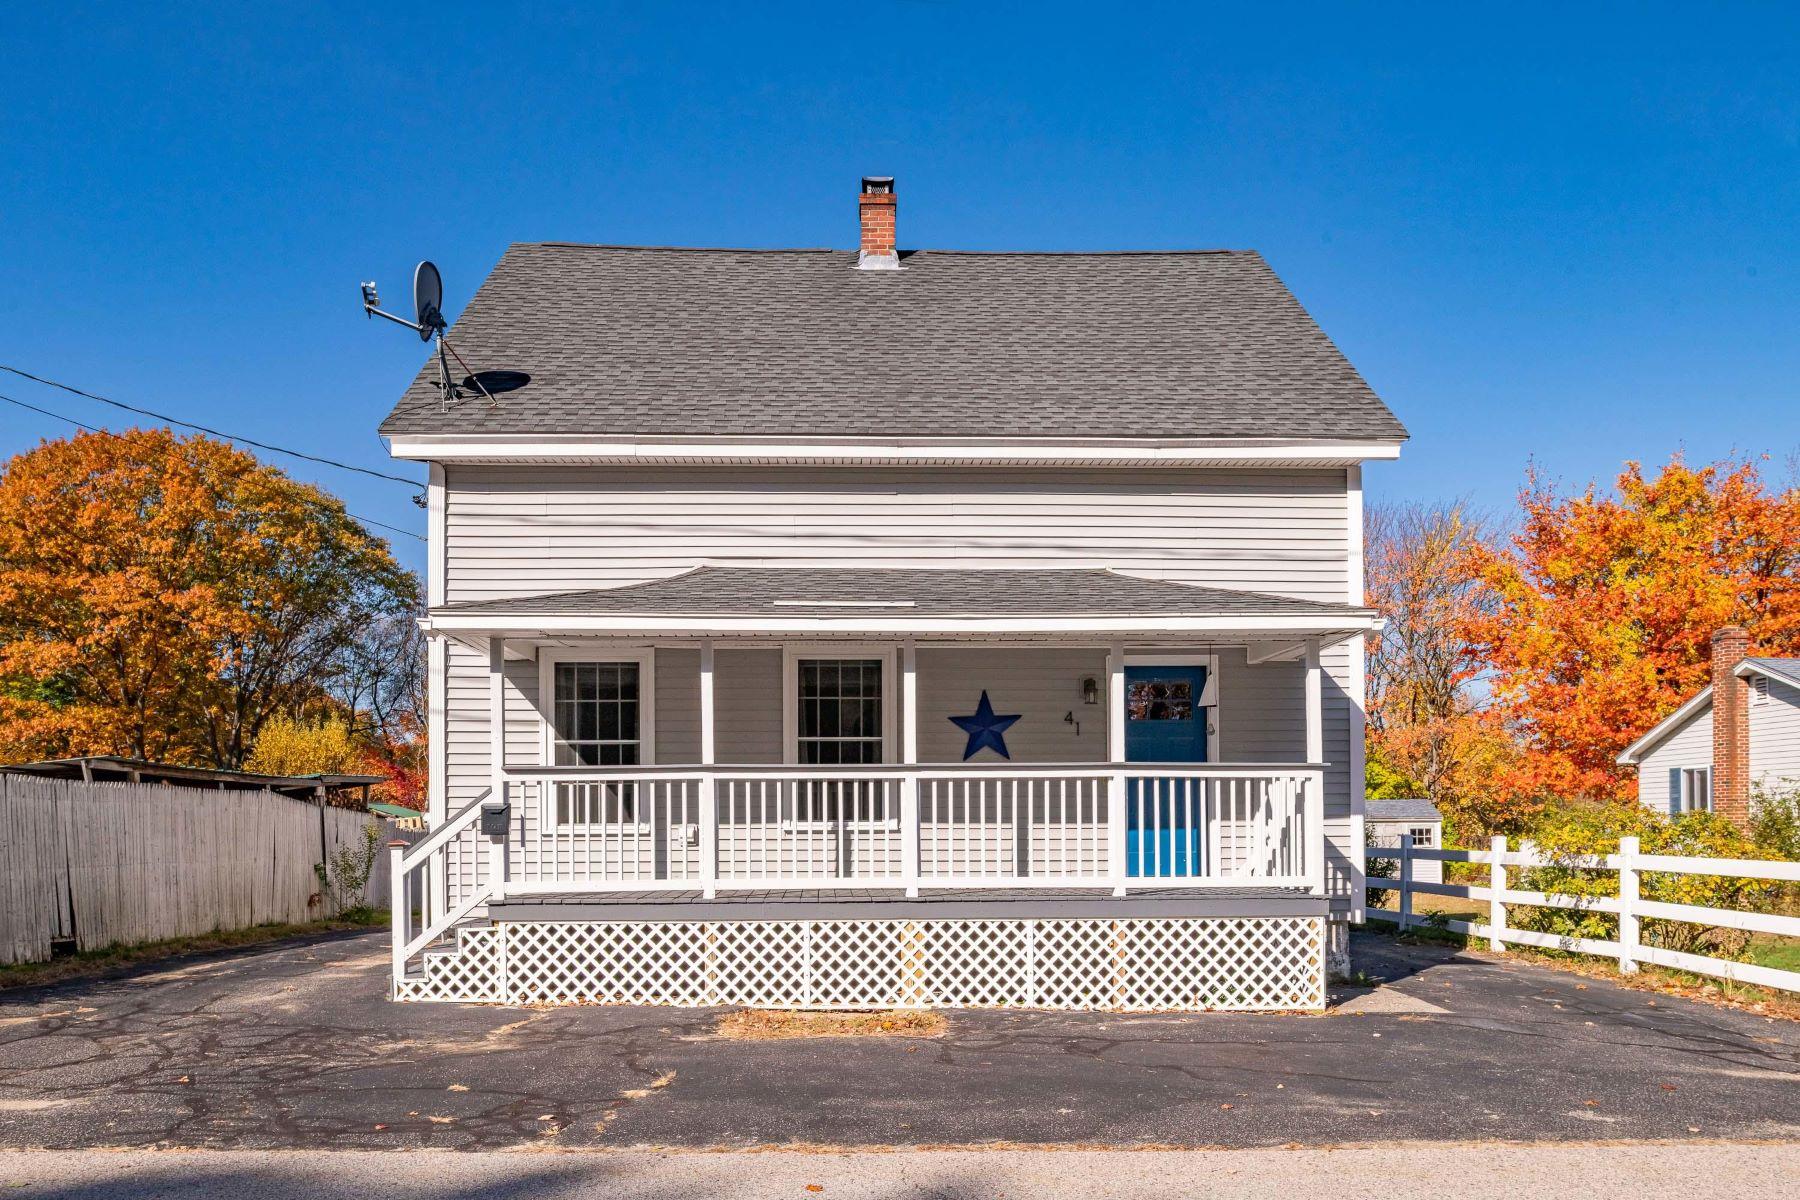 Single Family Homes for Active at 41 Glenwood Avenue Saco, Maine 04072 United States